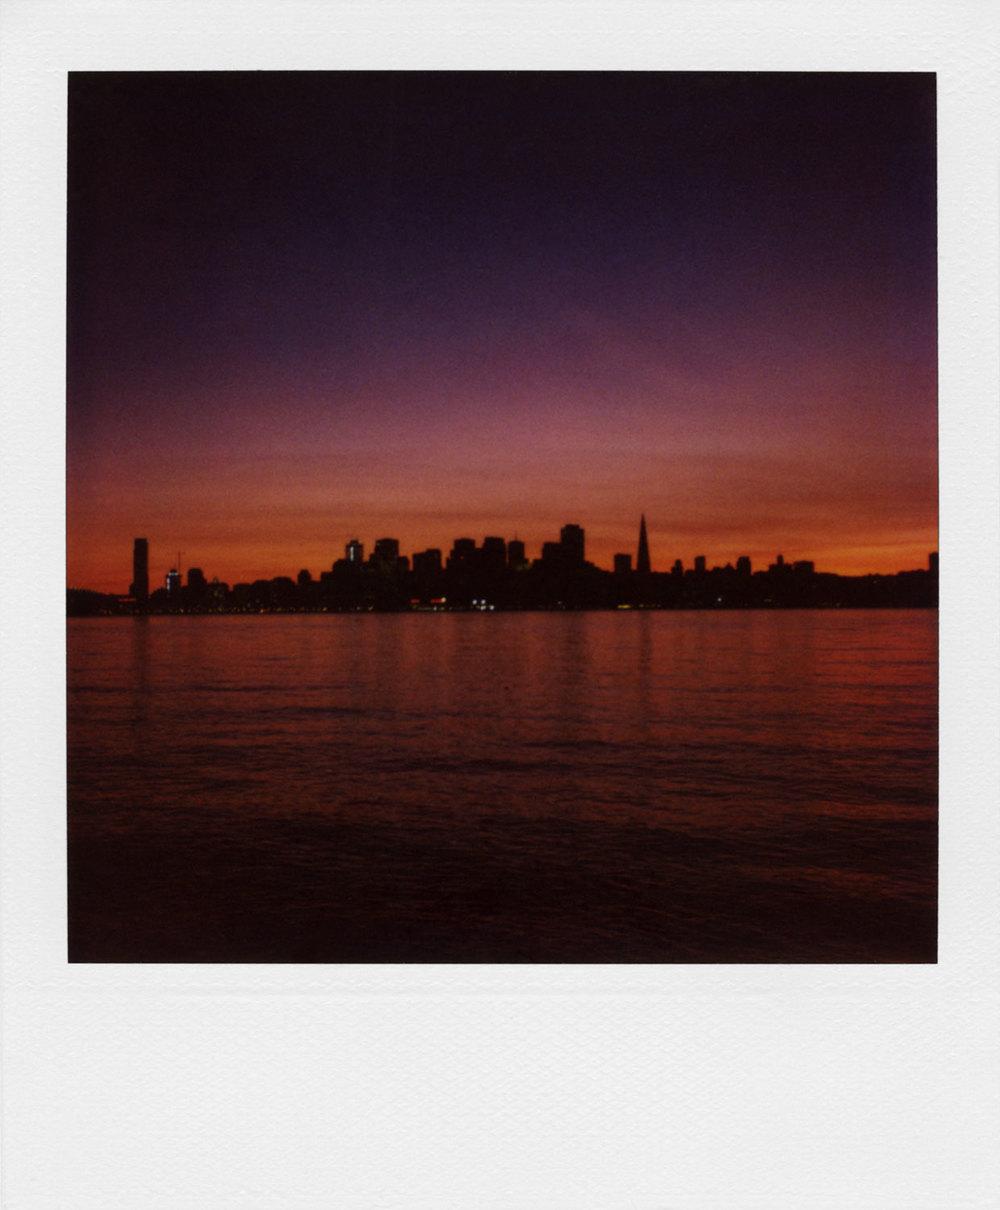 polaroid-44.jpg